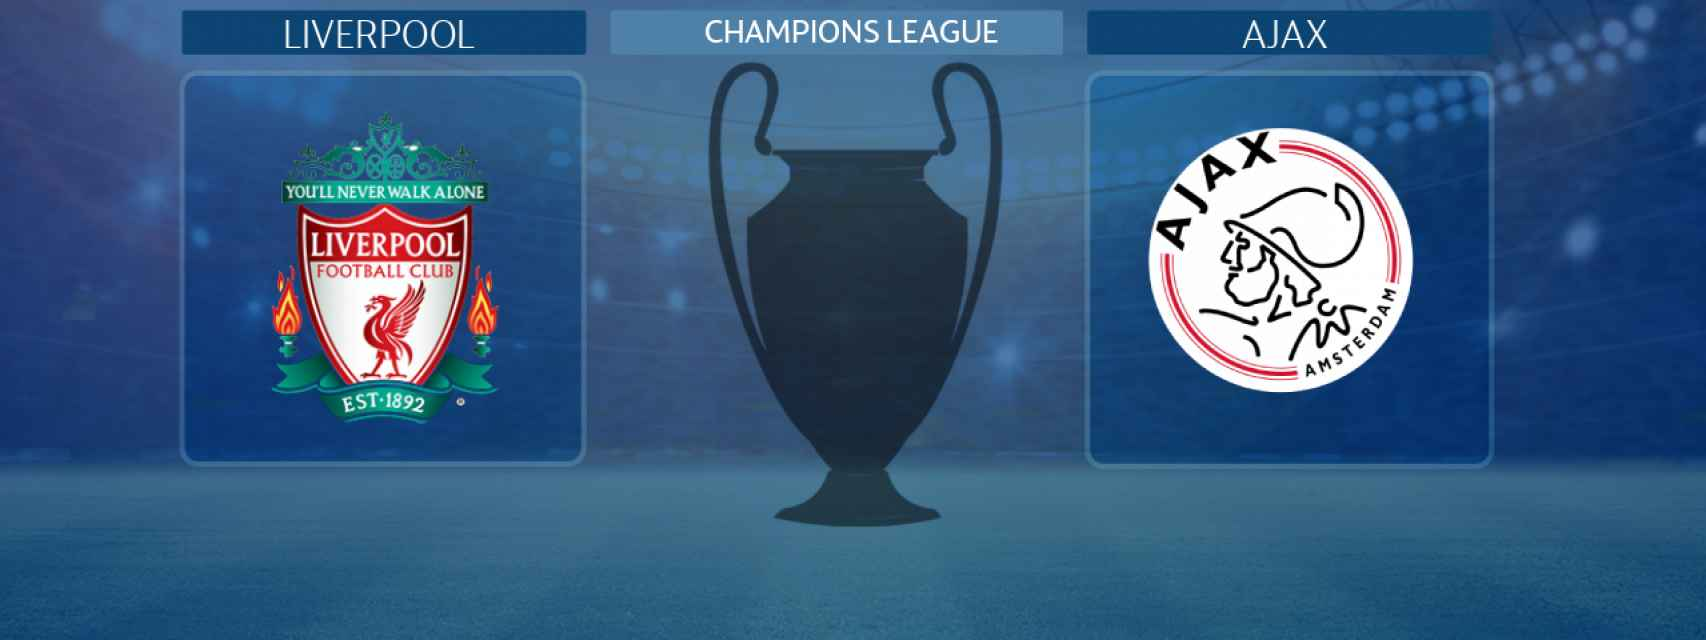 Liverpool - Ajax, partido de la Champions League